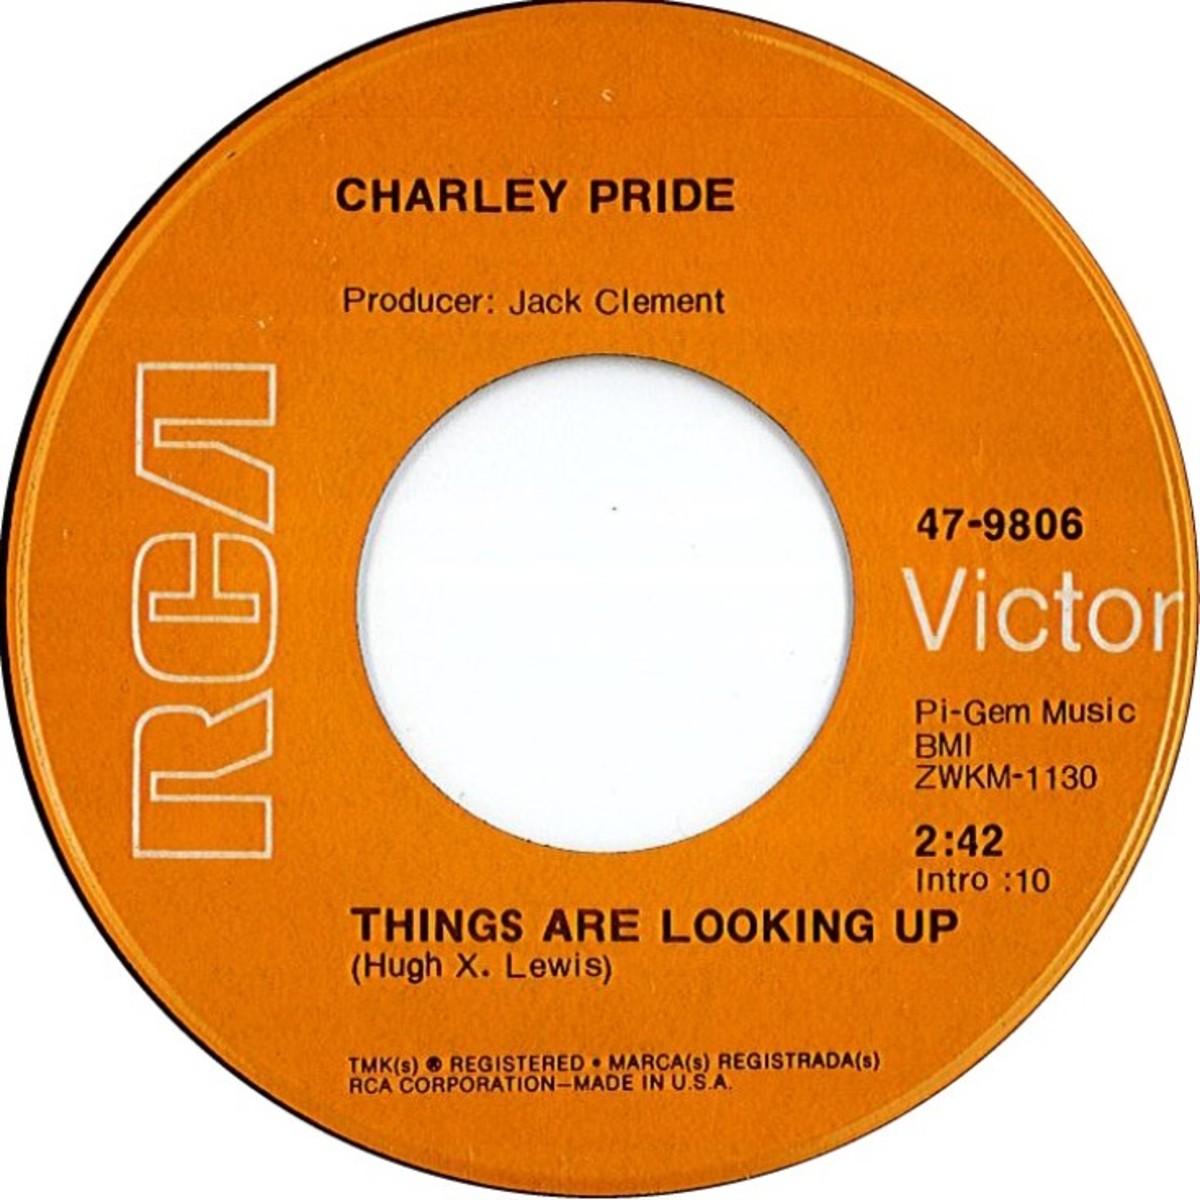 Charley flip side